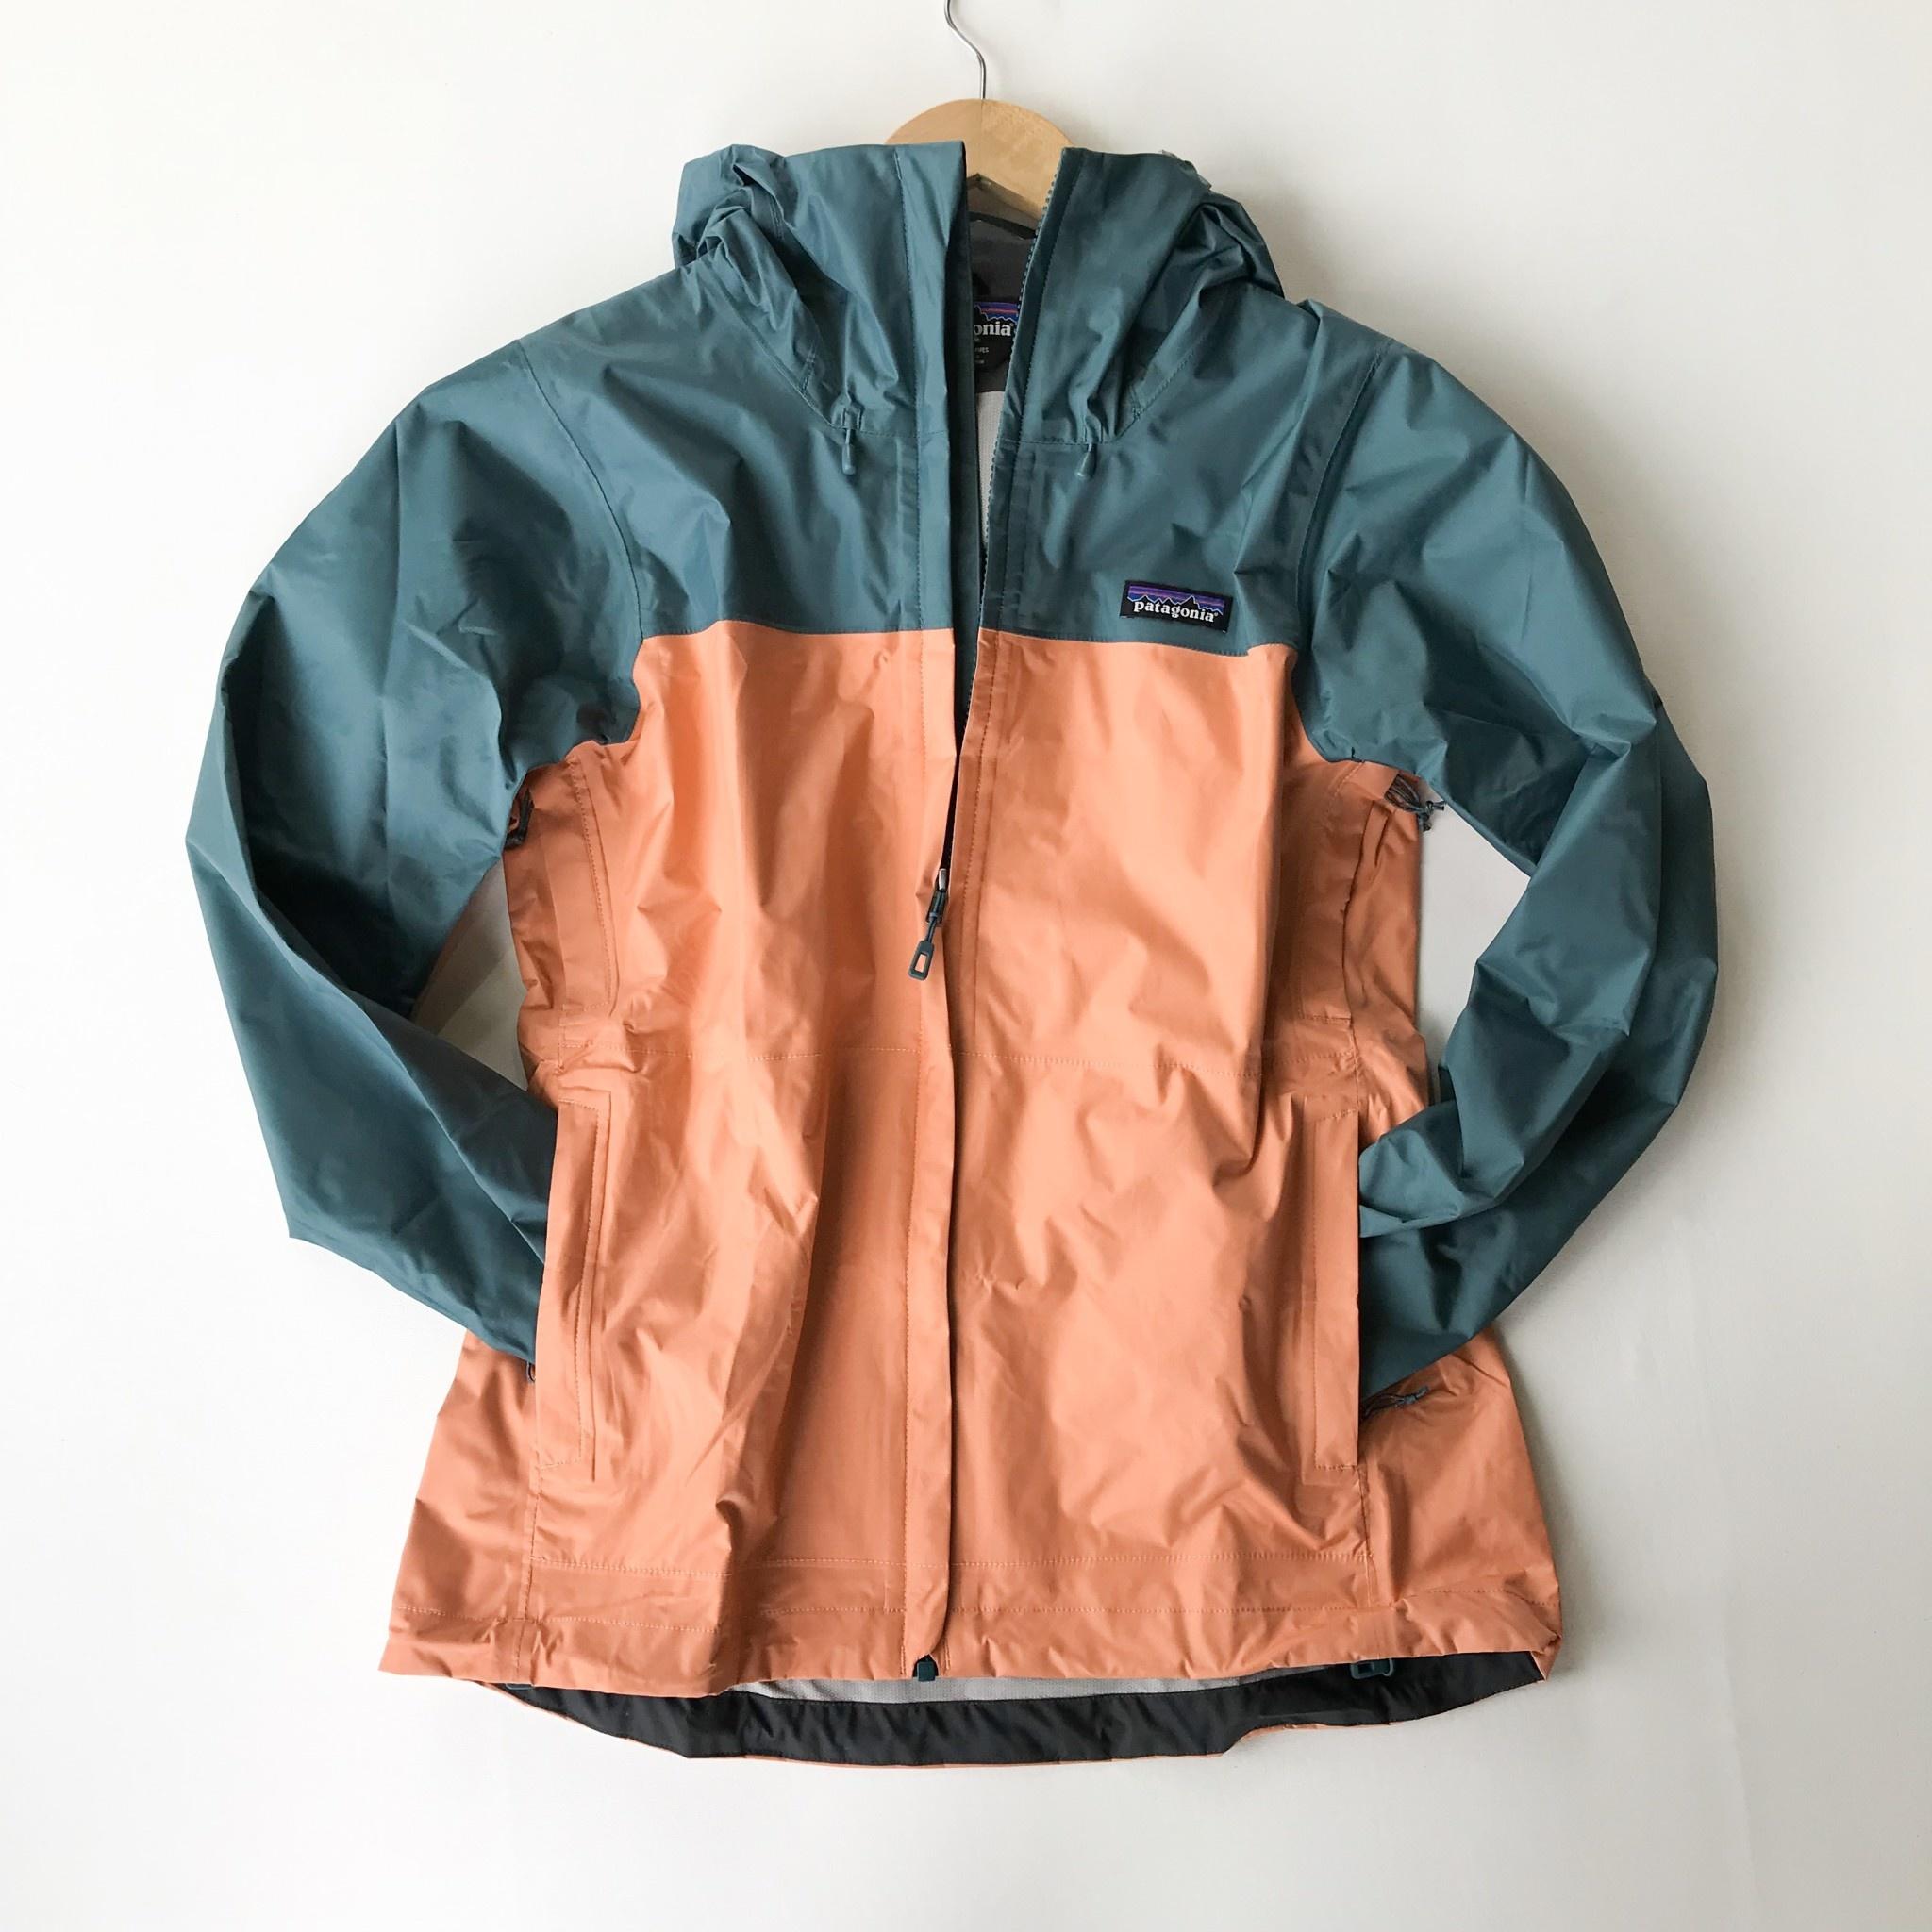 b839e686c4ebf Patagonia Torrentshell Tomato Jacket | Women's rain jacket | Blue ...